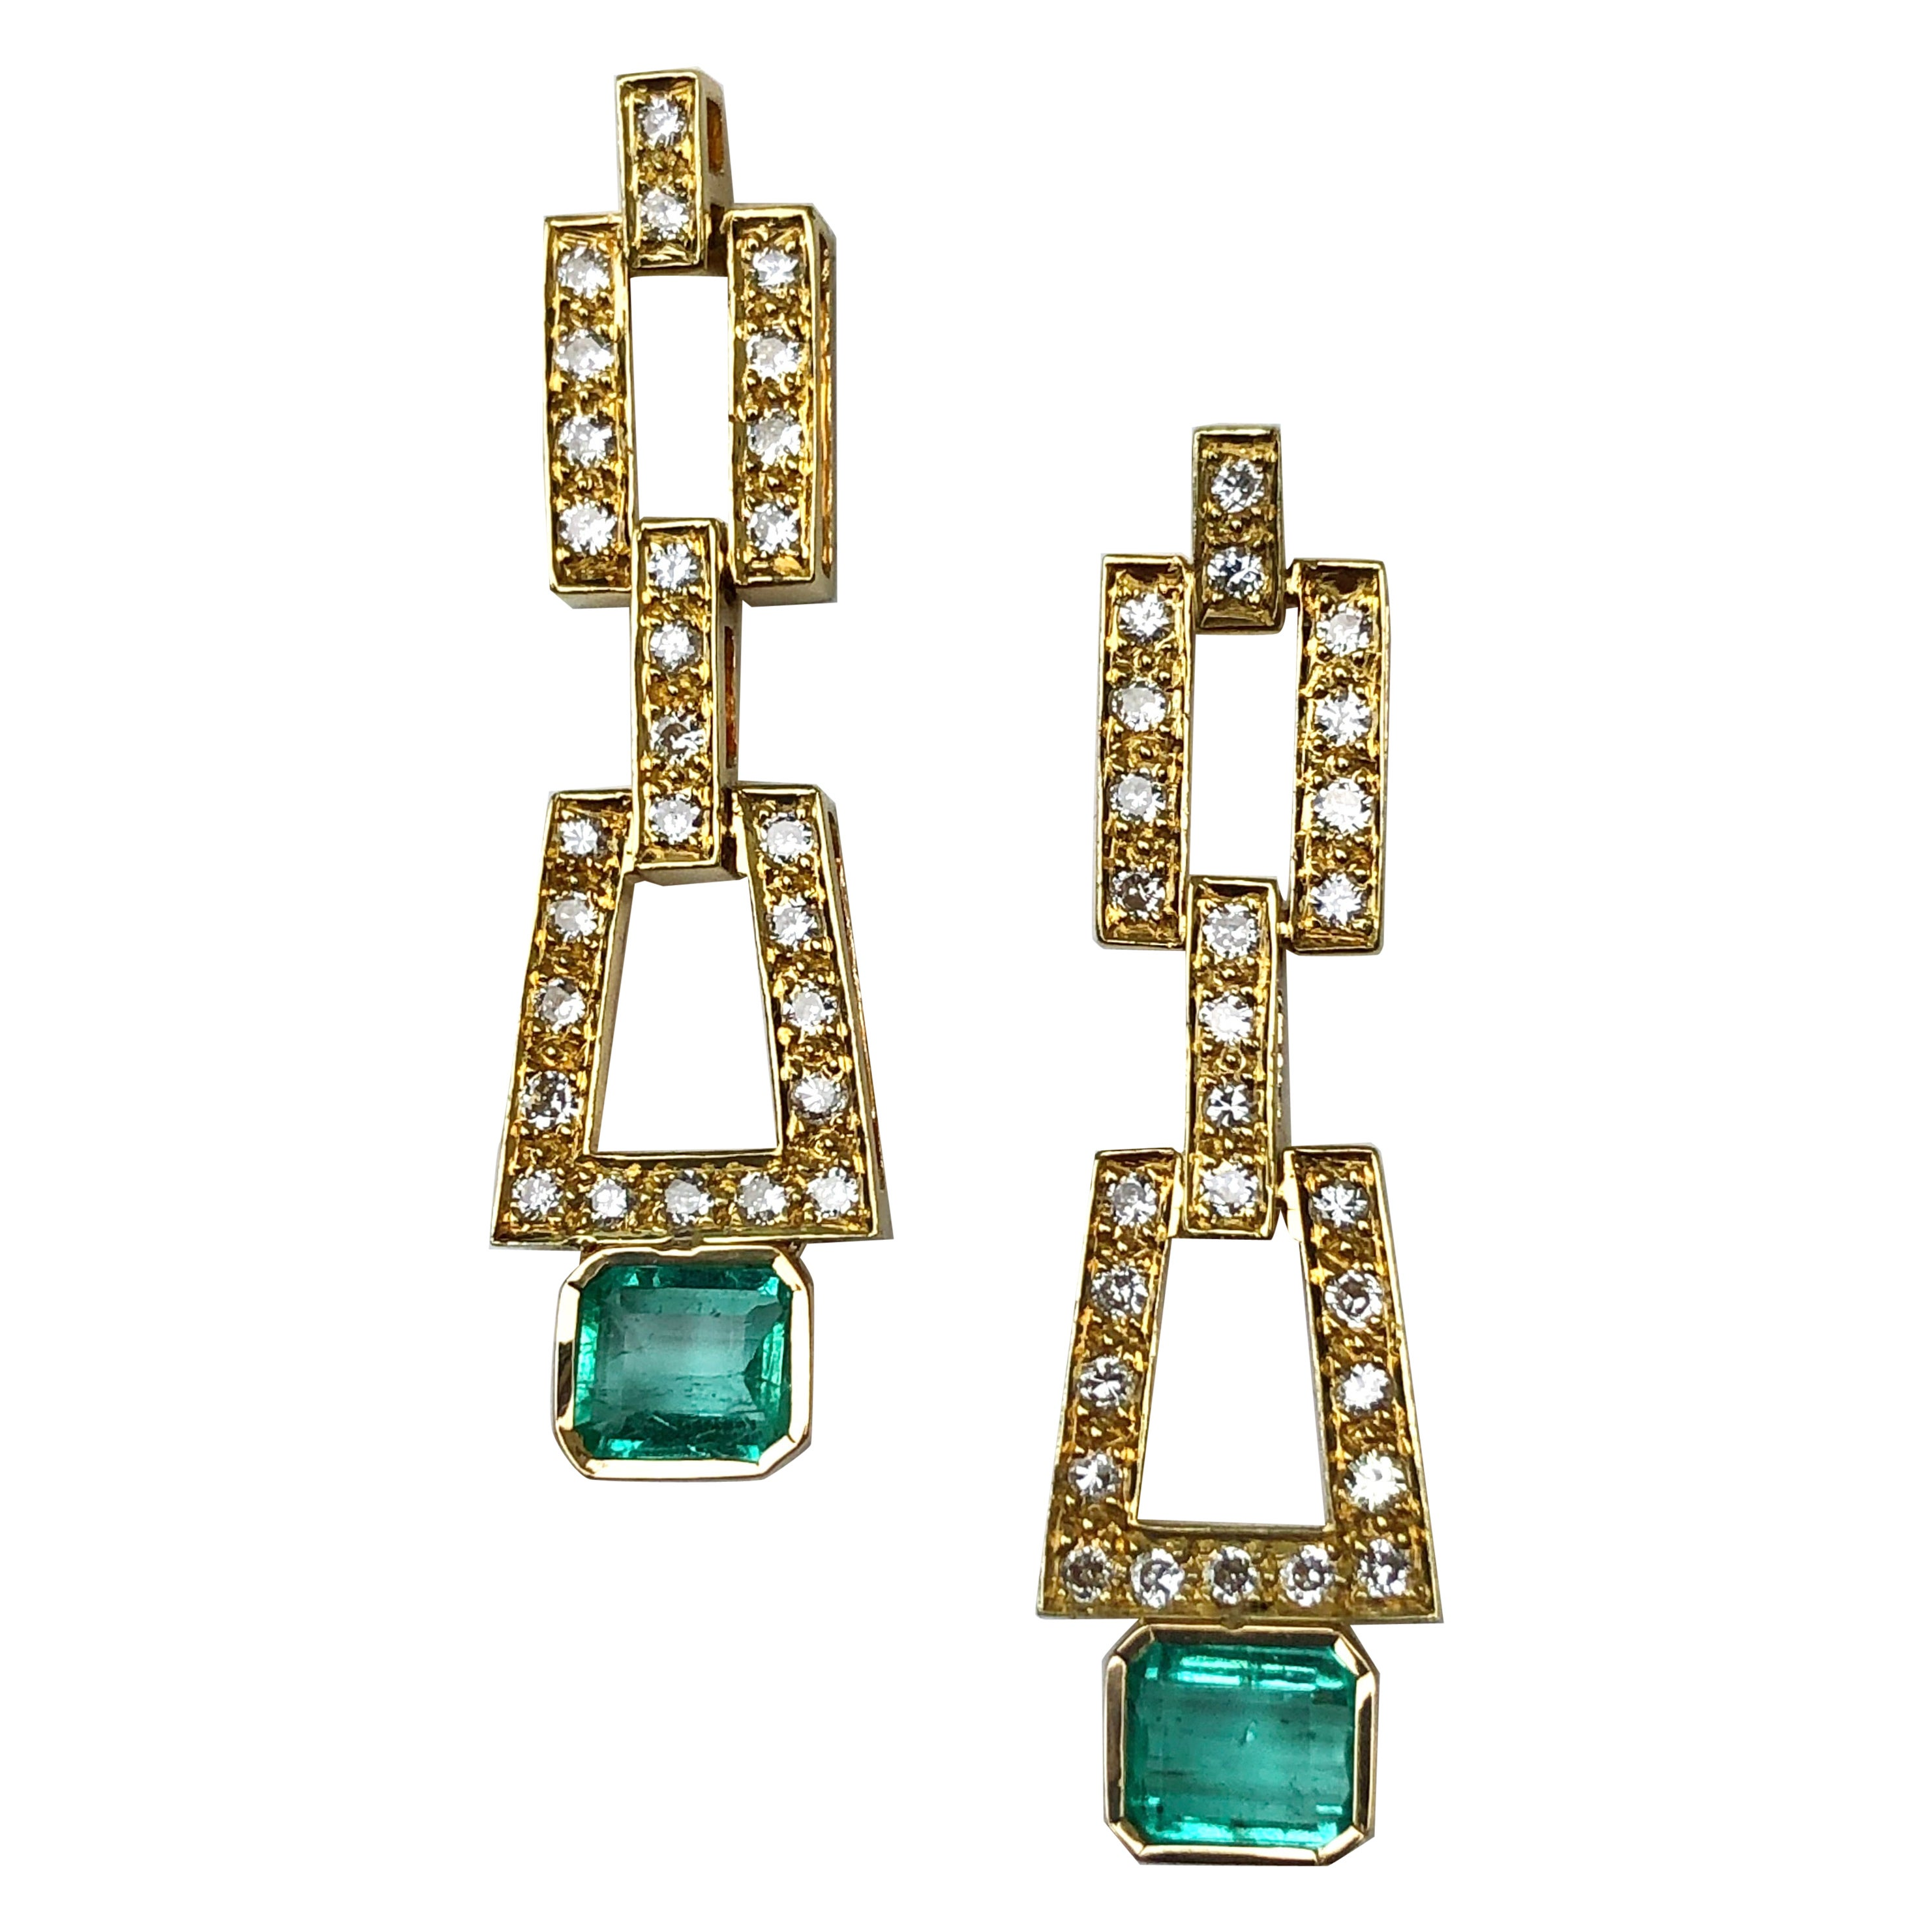 2.80 Carat Deco Style Natural Colombian Emerald Diamond Drop Earrings 18 Karat